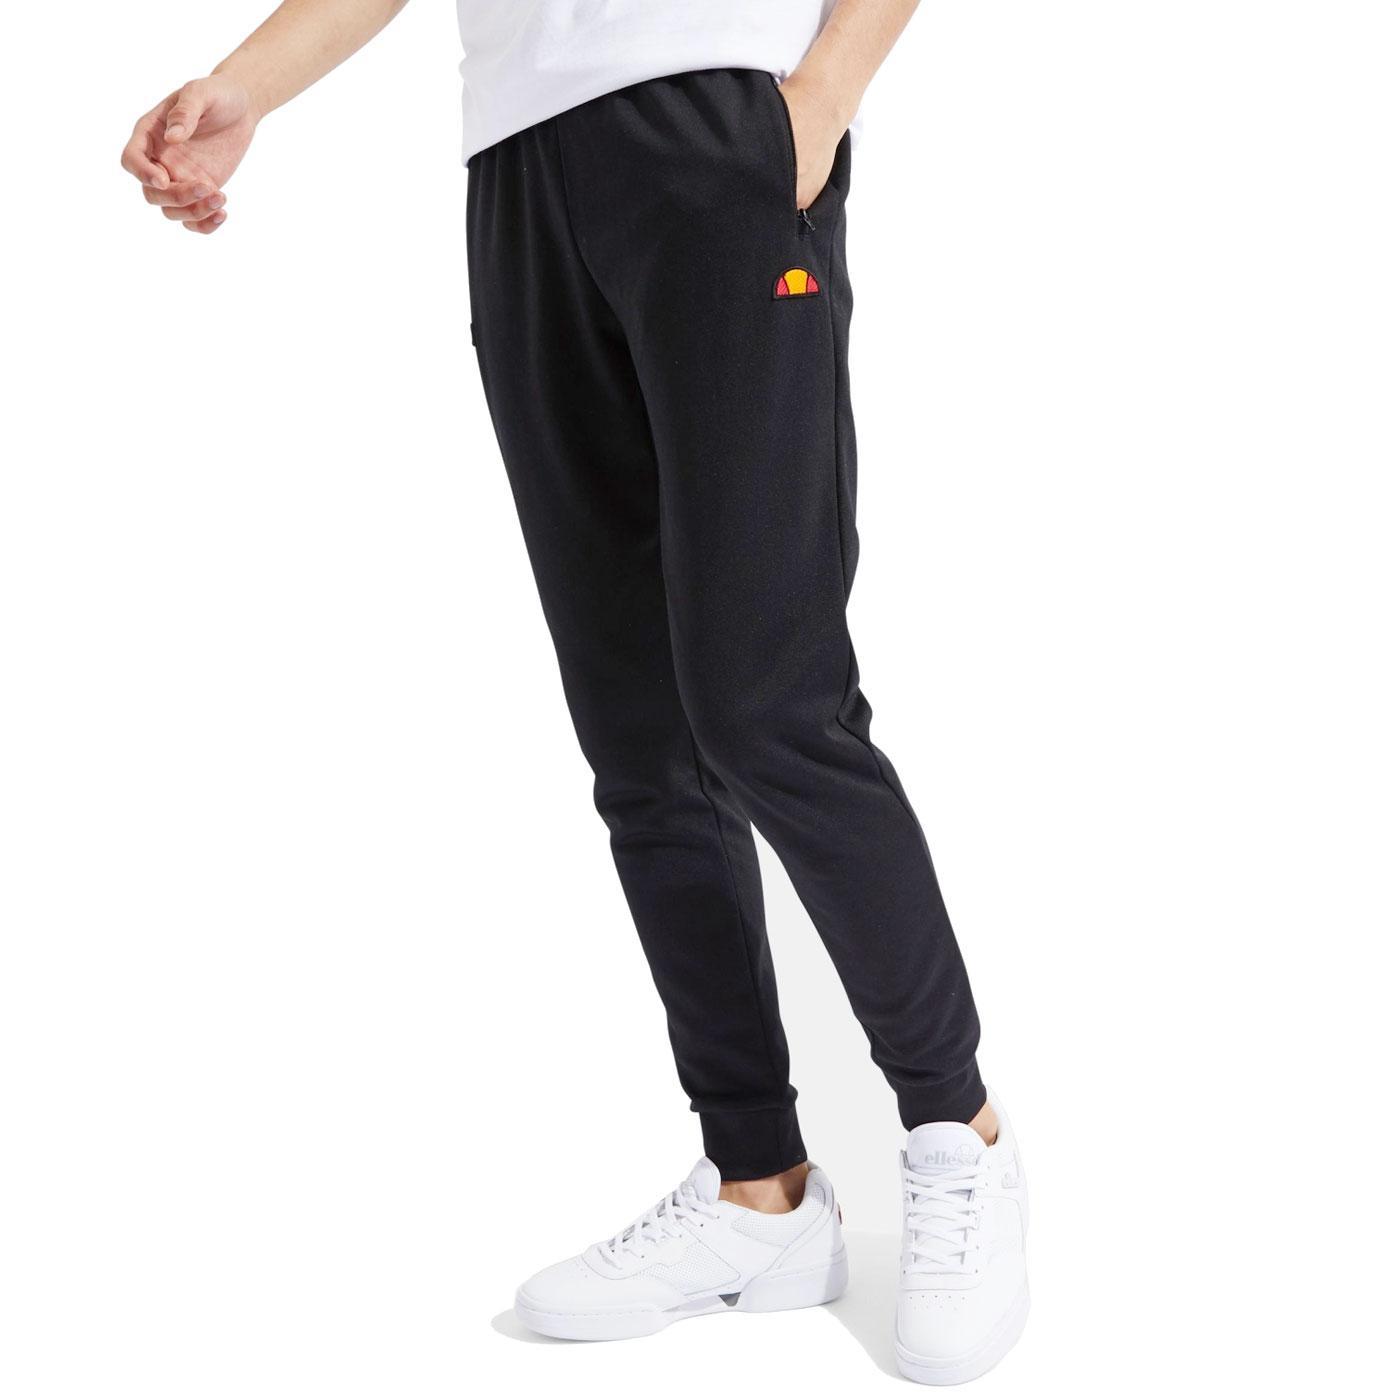 Bertoni ELLESSE Mens Retro Track Pants (Black)